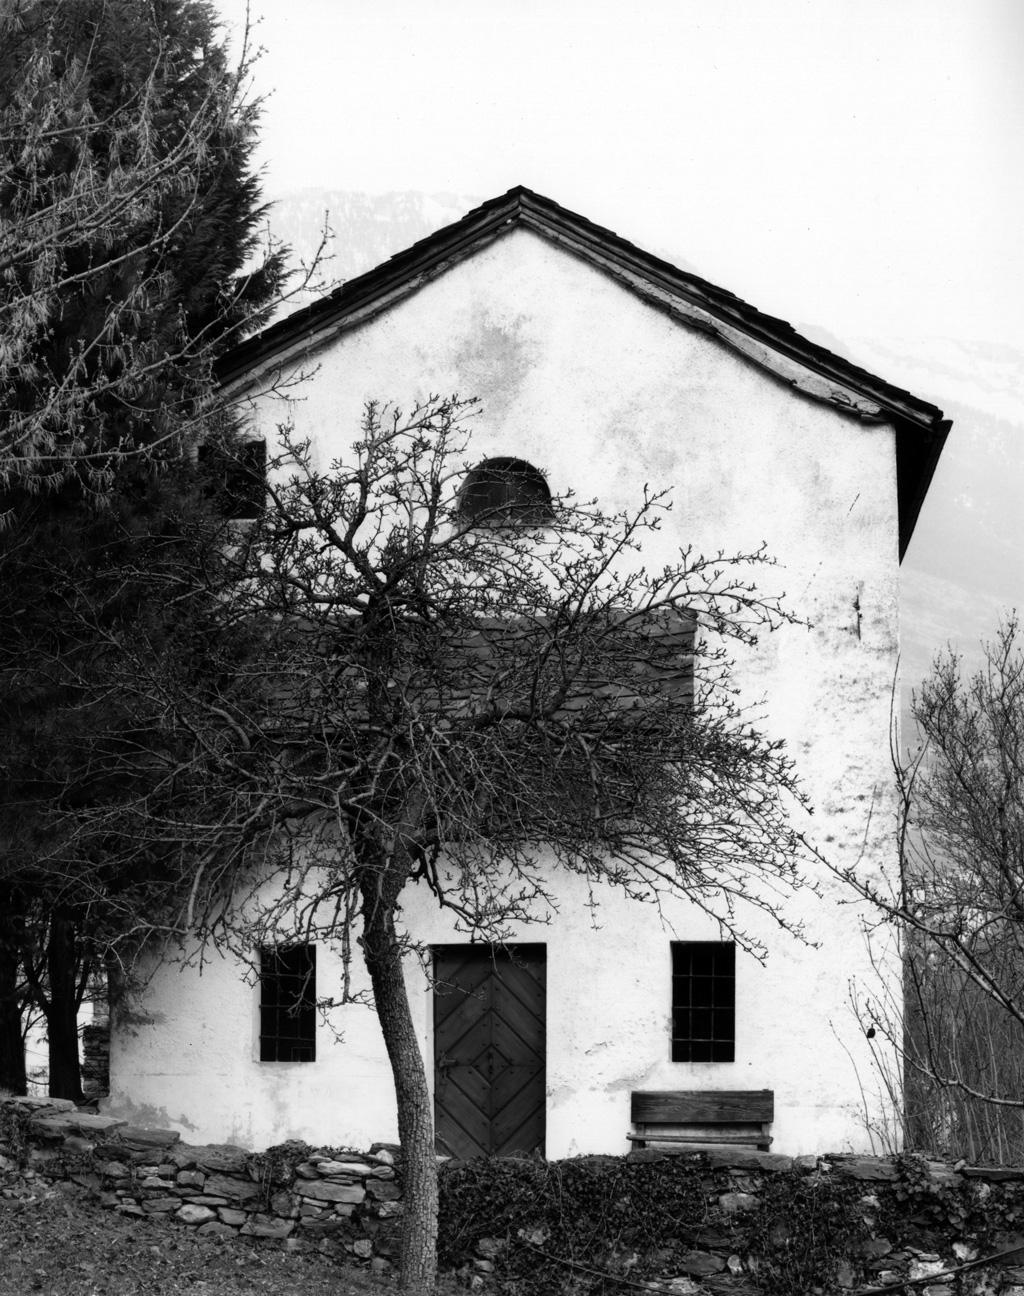 Kapelle von Muzot, 1970er Jahre (Foto: Gérard Salamin)